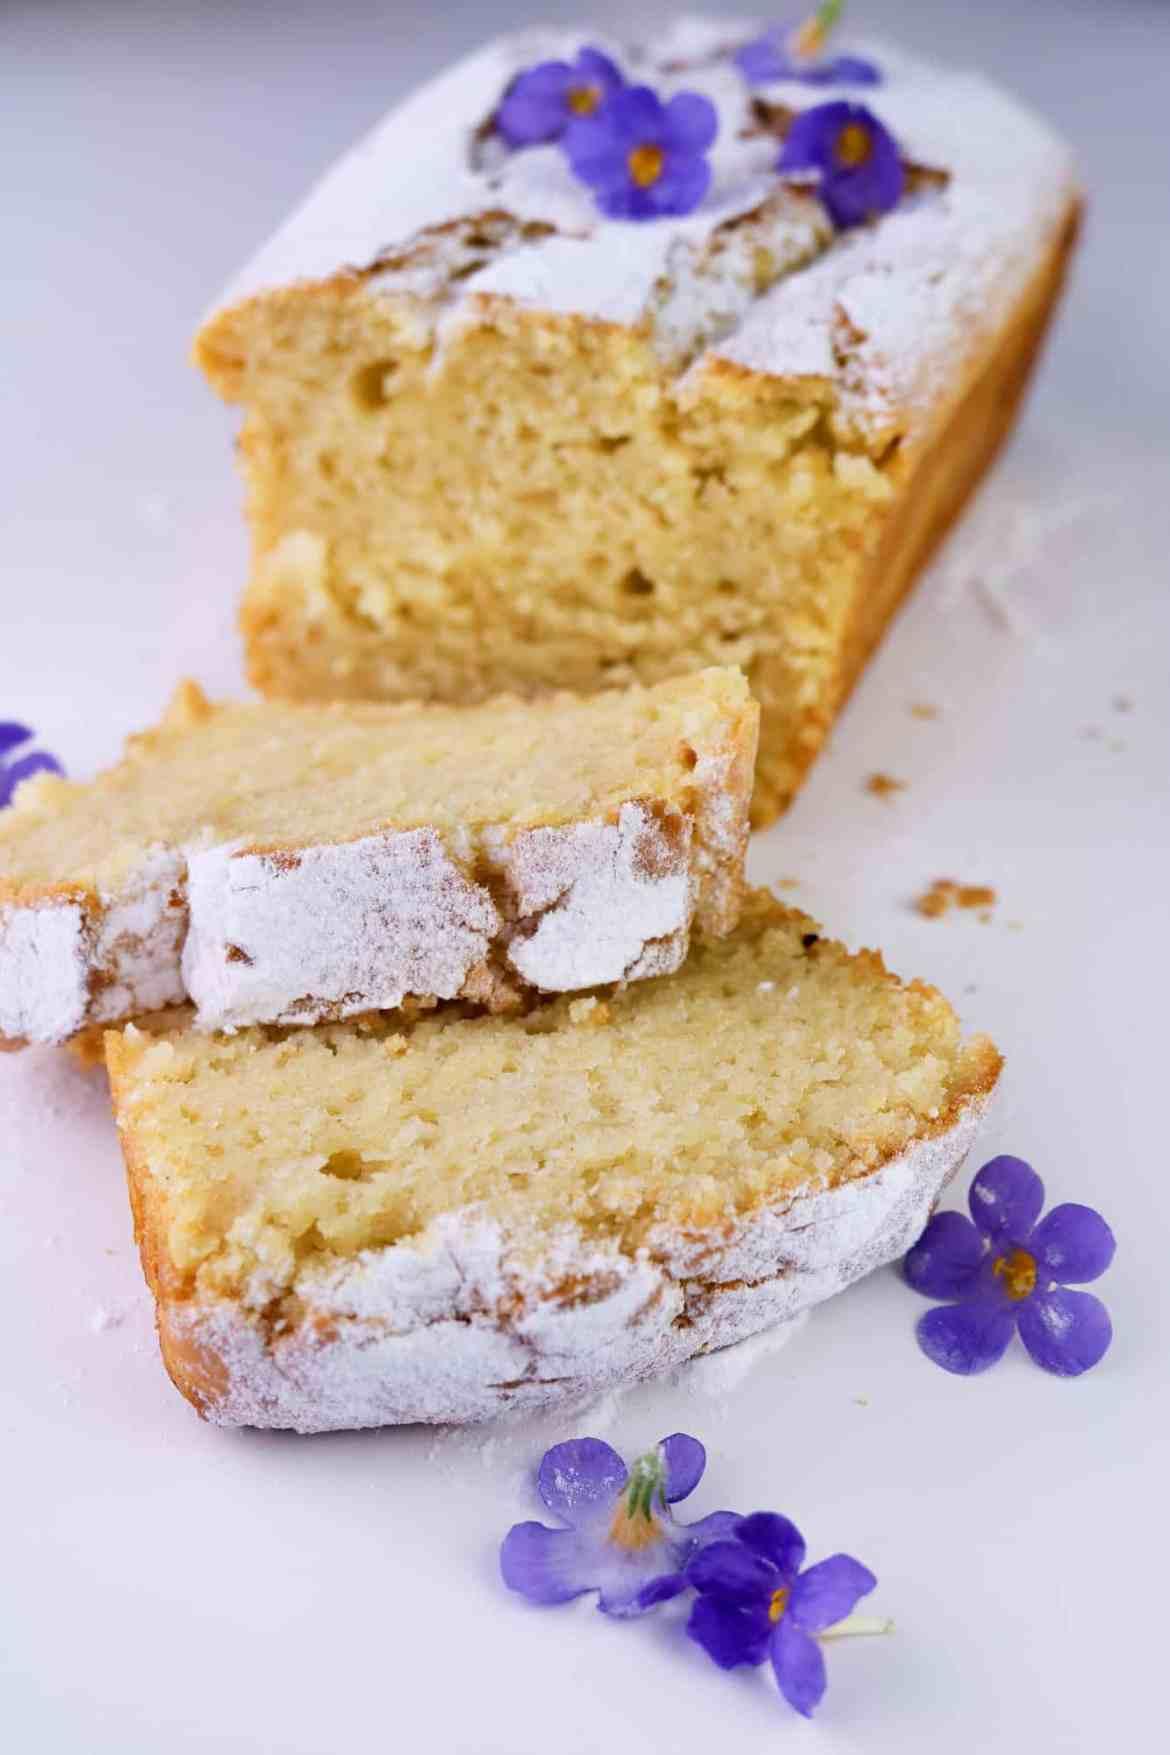 This easy vegan lemon pound cake is soft, silky, light, fluffy and aromatic, with an irresistible lemony aftertaste. #vegan #poundcake #plantbased #eggless #dairyfree #lemon #sweet #dessert #madeira #sugar #baking #veganbake #vegetarian #eggfree